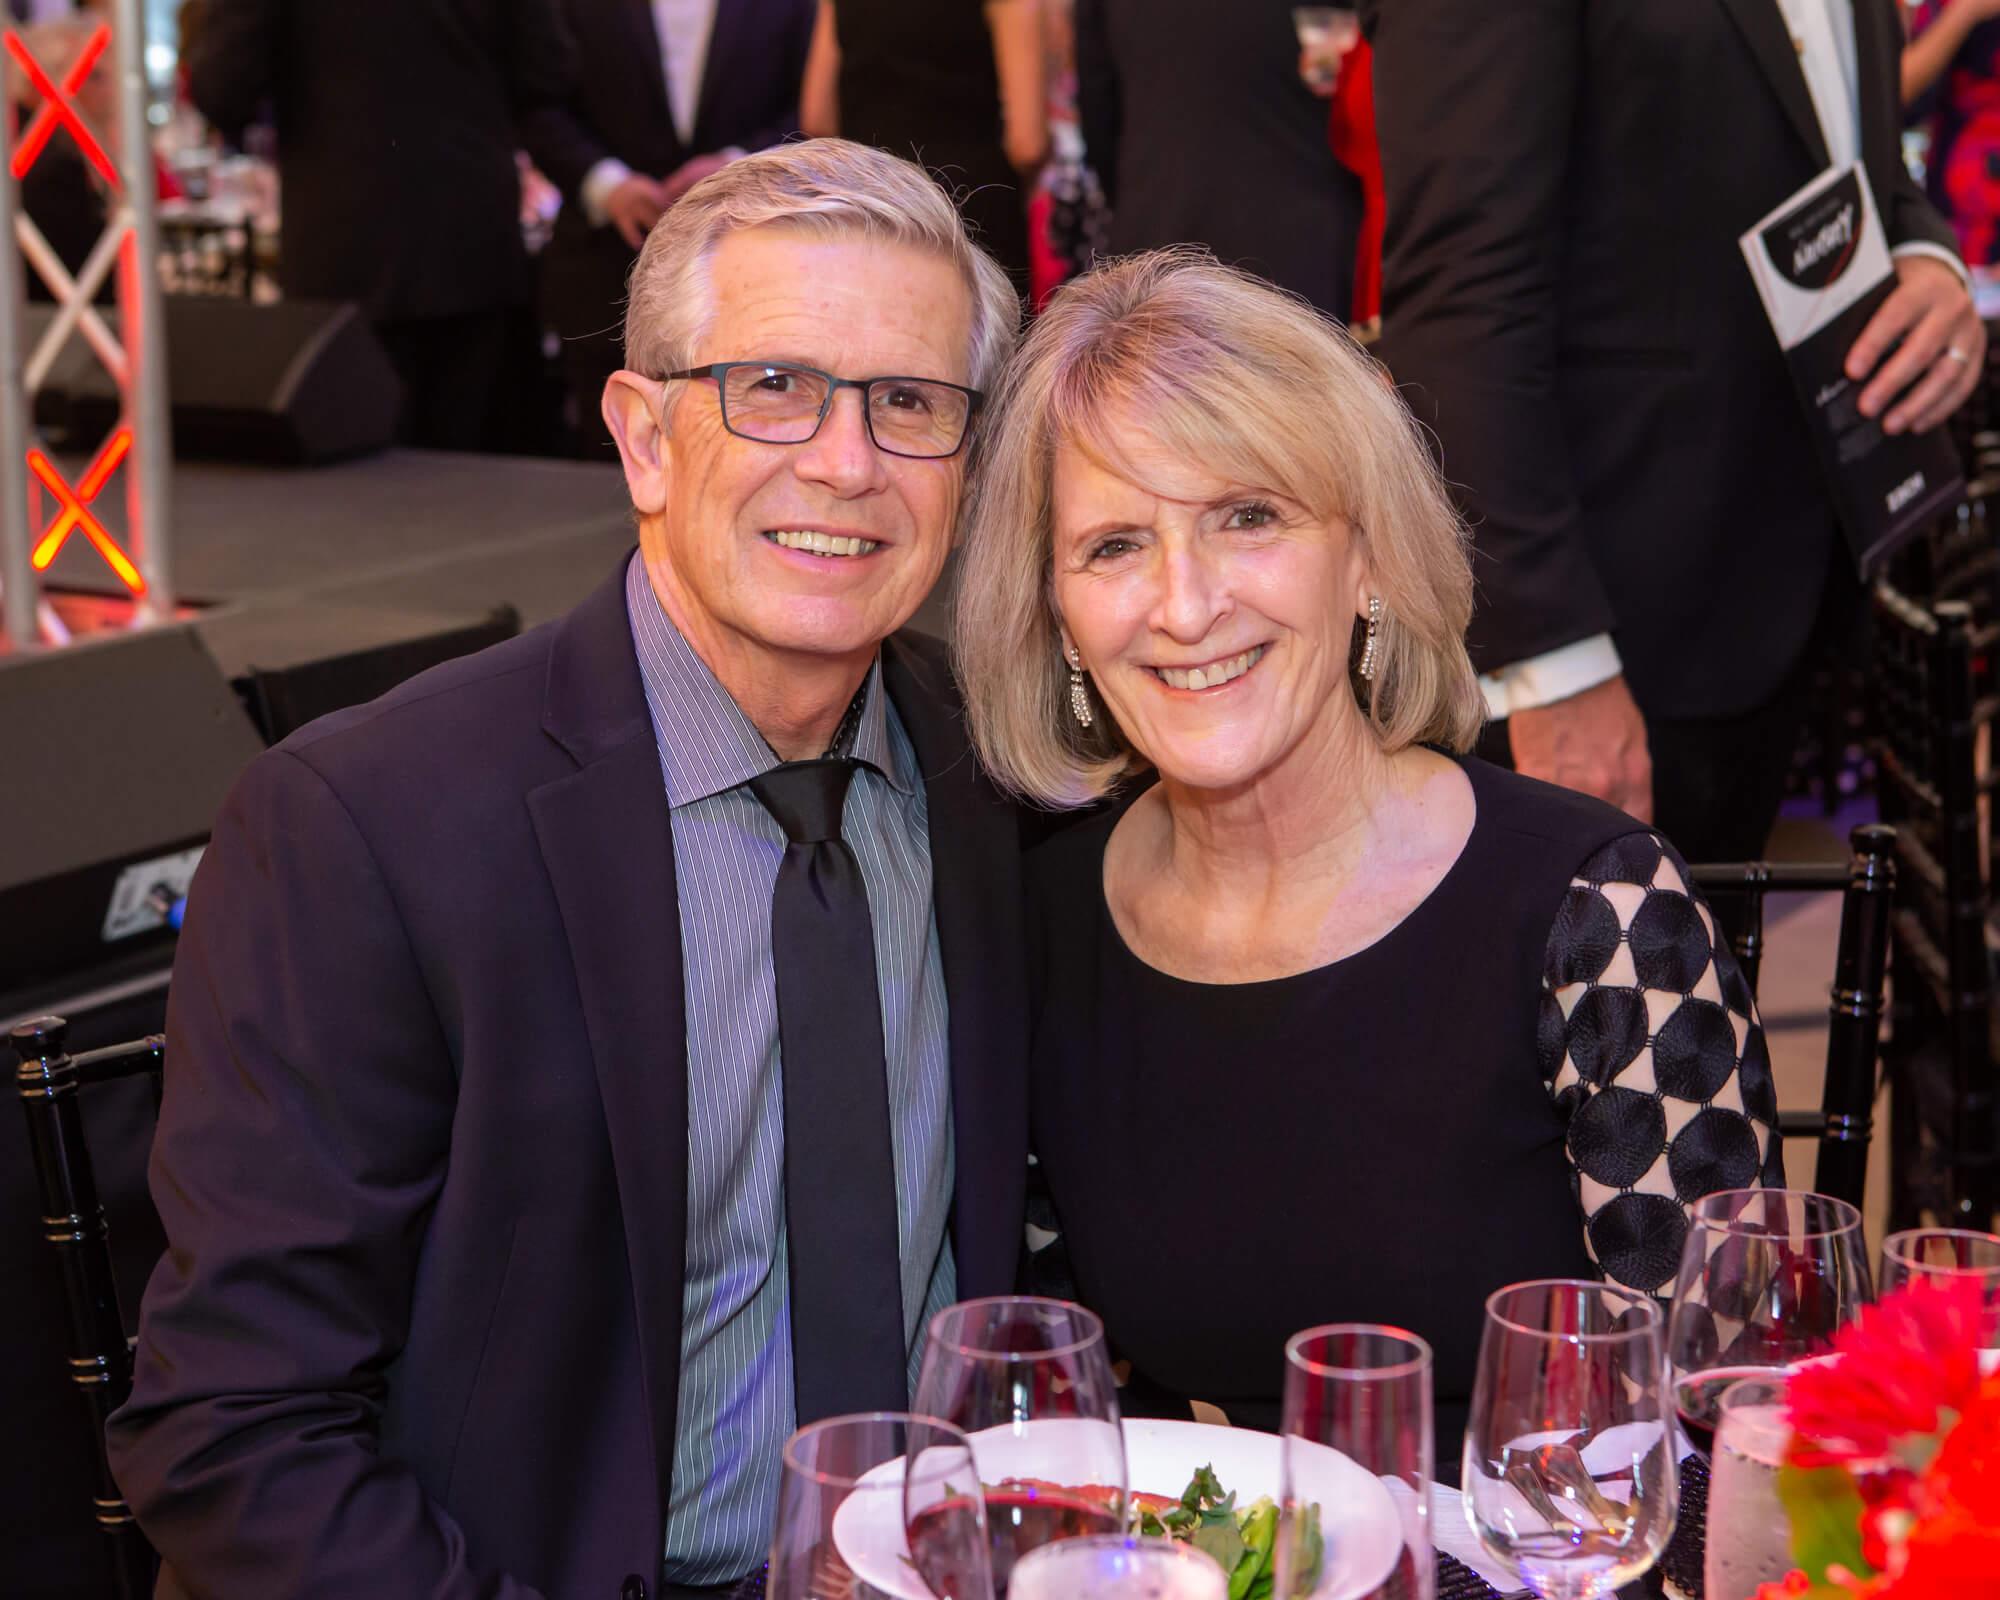 Chris and Carol Adams